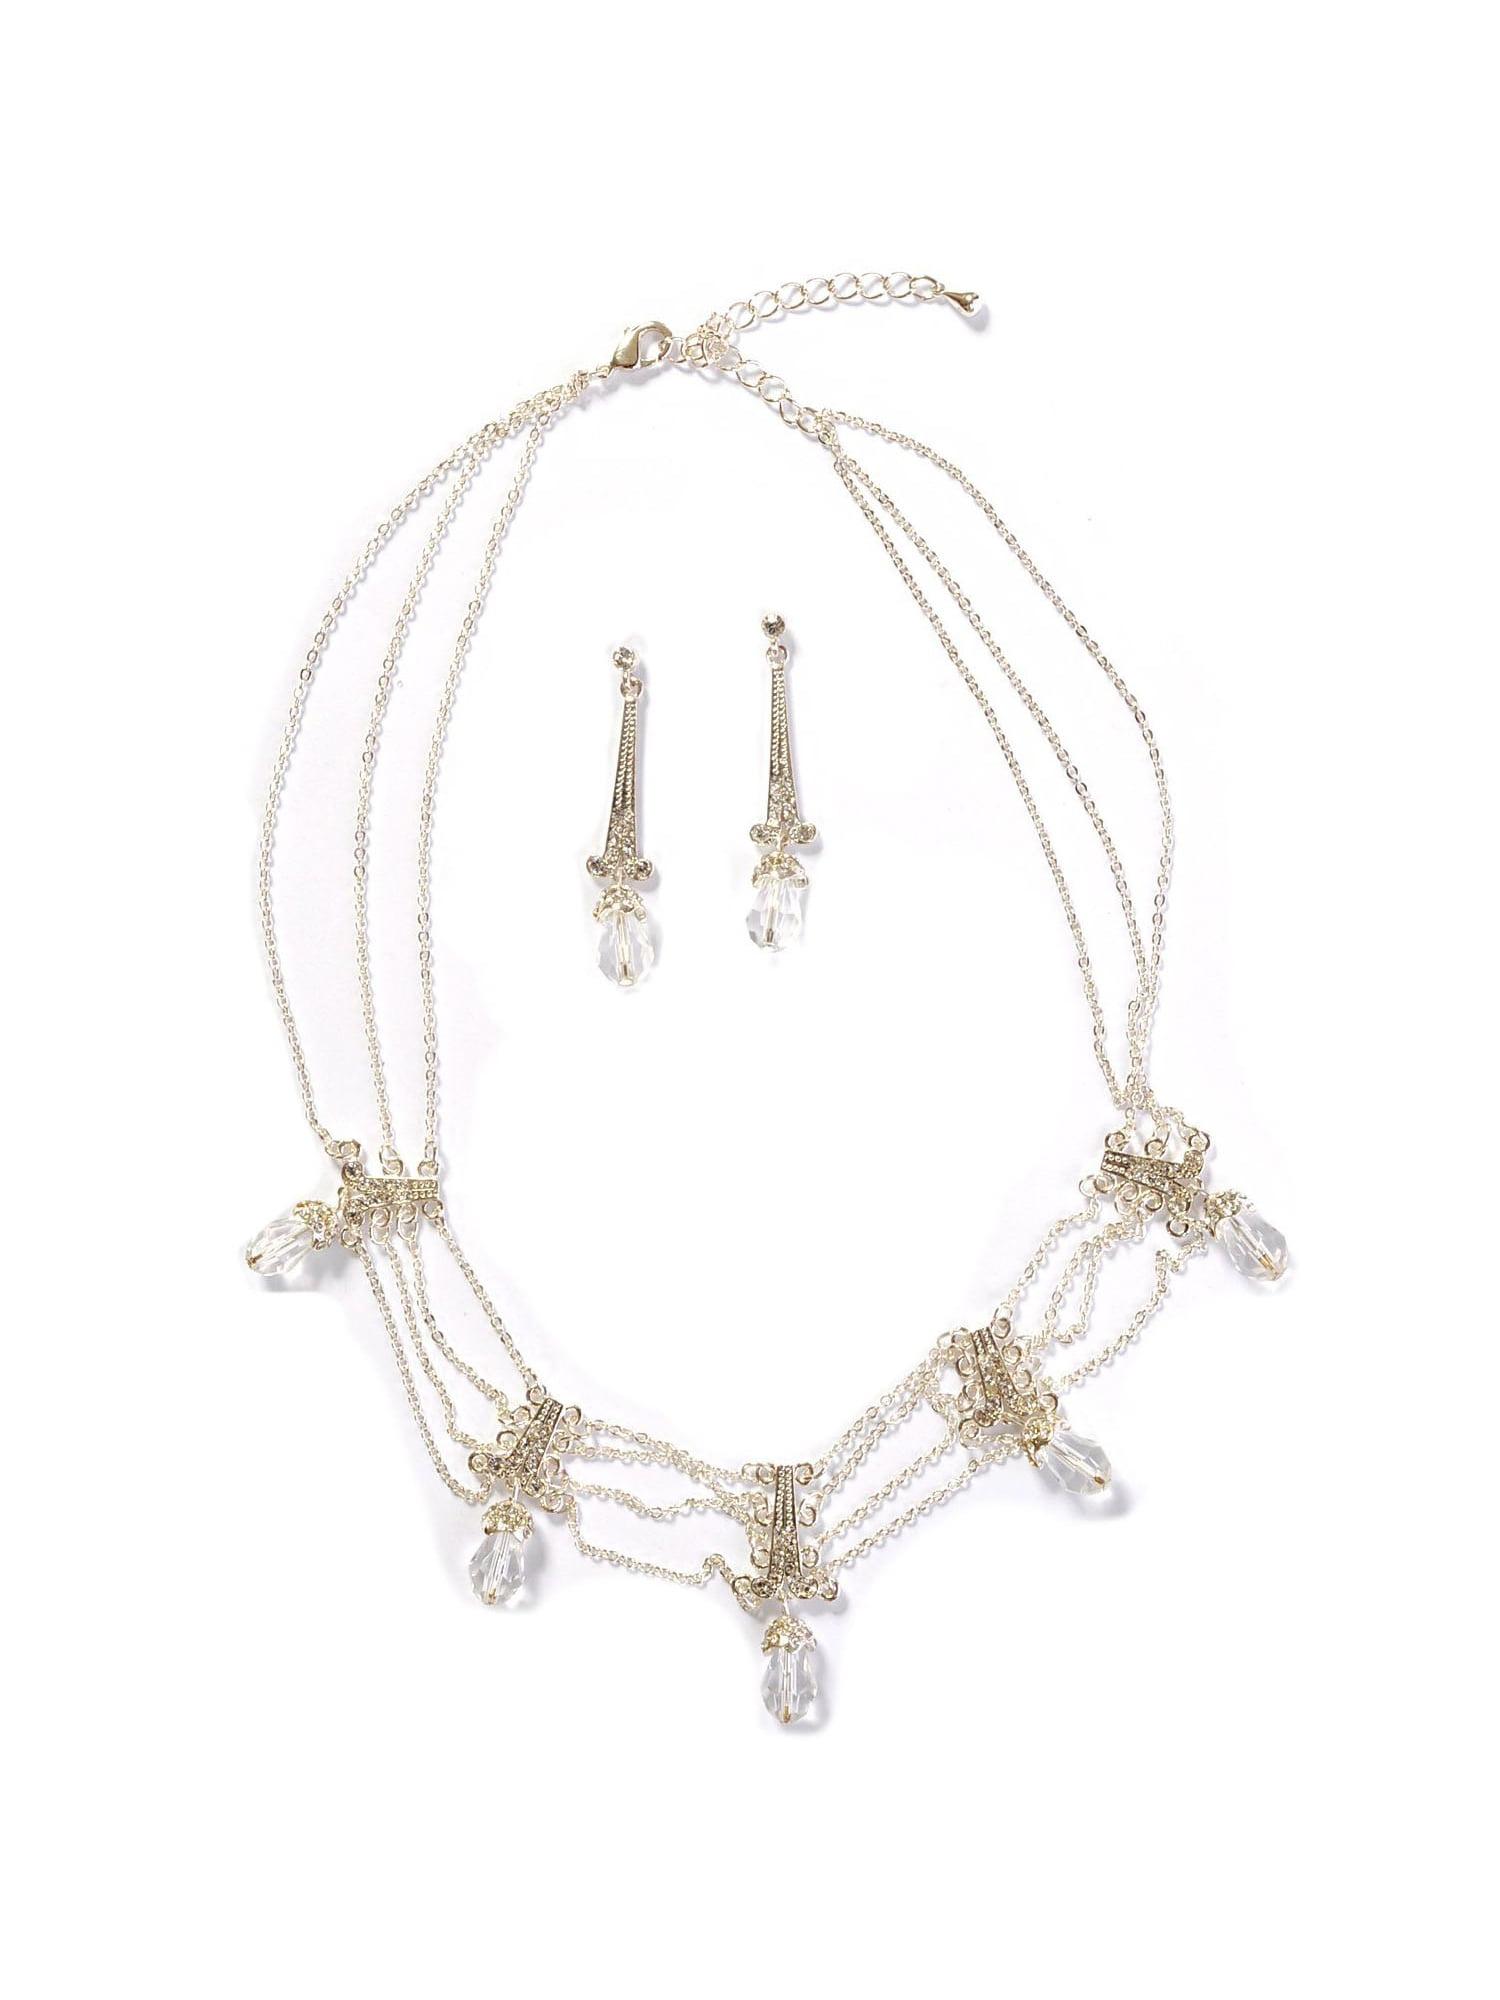 3230e56901d7 coolcrystal - Silver Crystal Multi Row Tied Strands Rhinestone Necklace   Dangle  Crystal Earrings Jewelry Set - Walmart.com